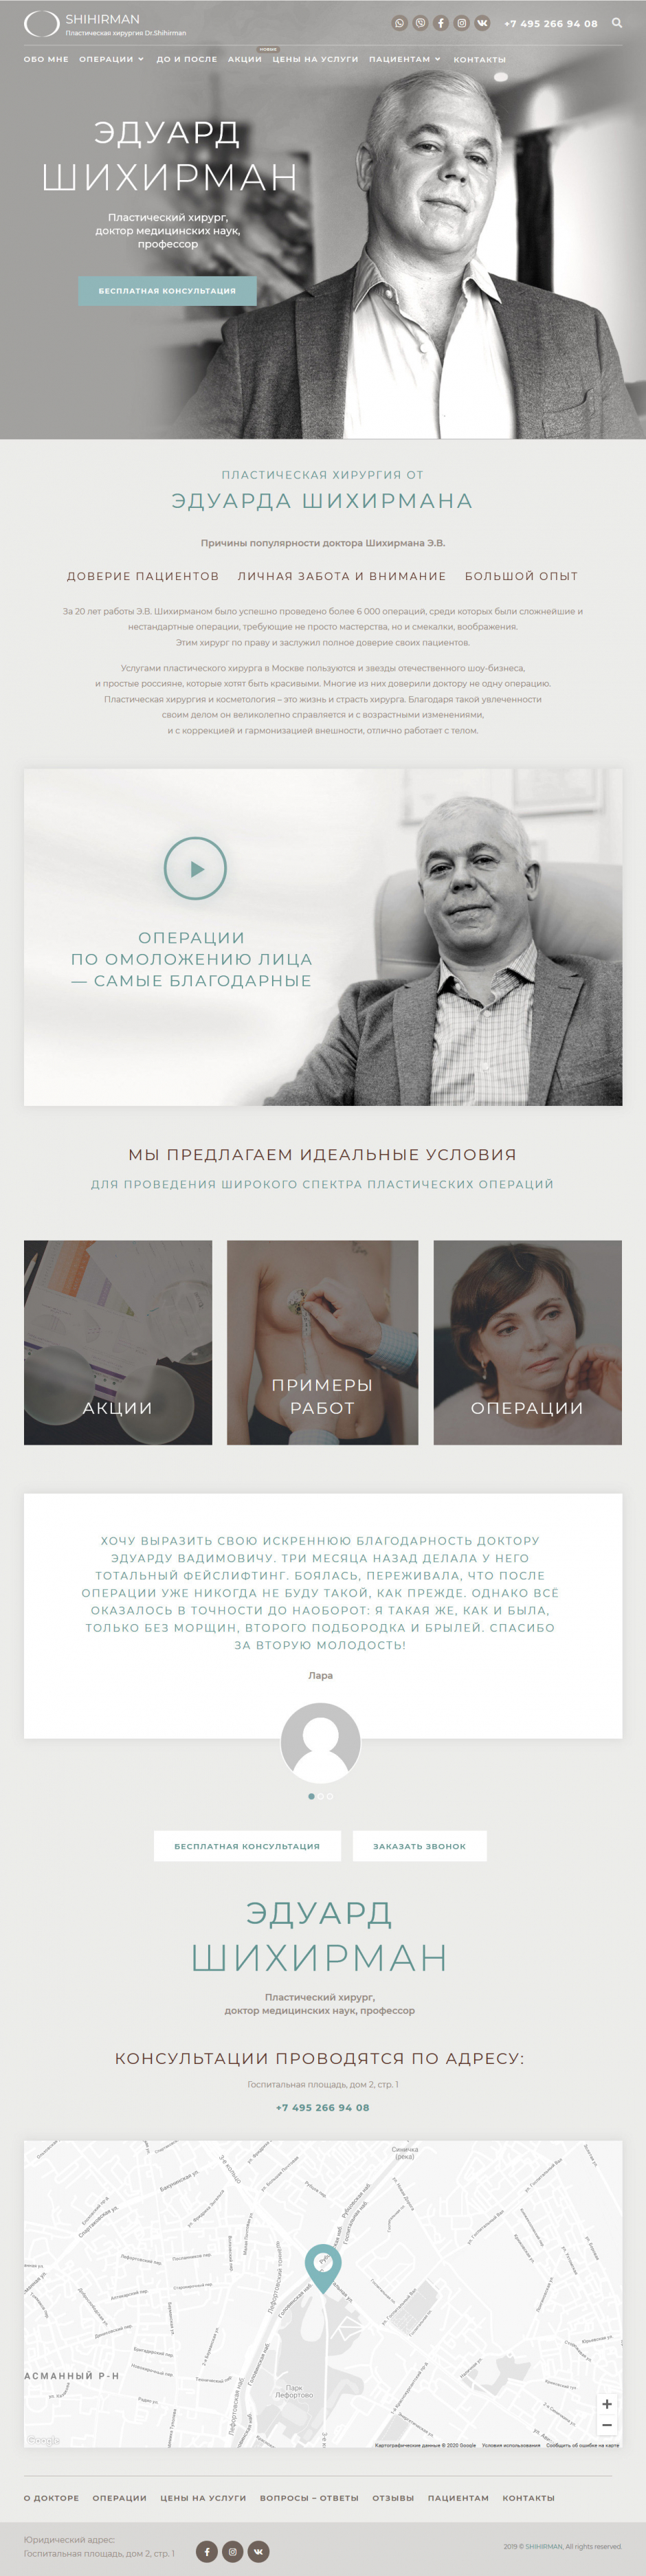 Редизайн сайта для пластического хирурга Эдуарда Шихирмана